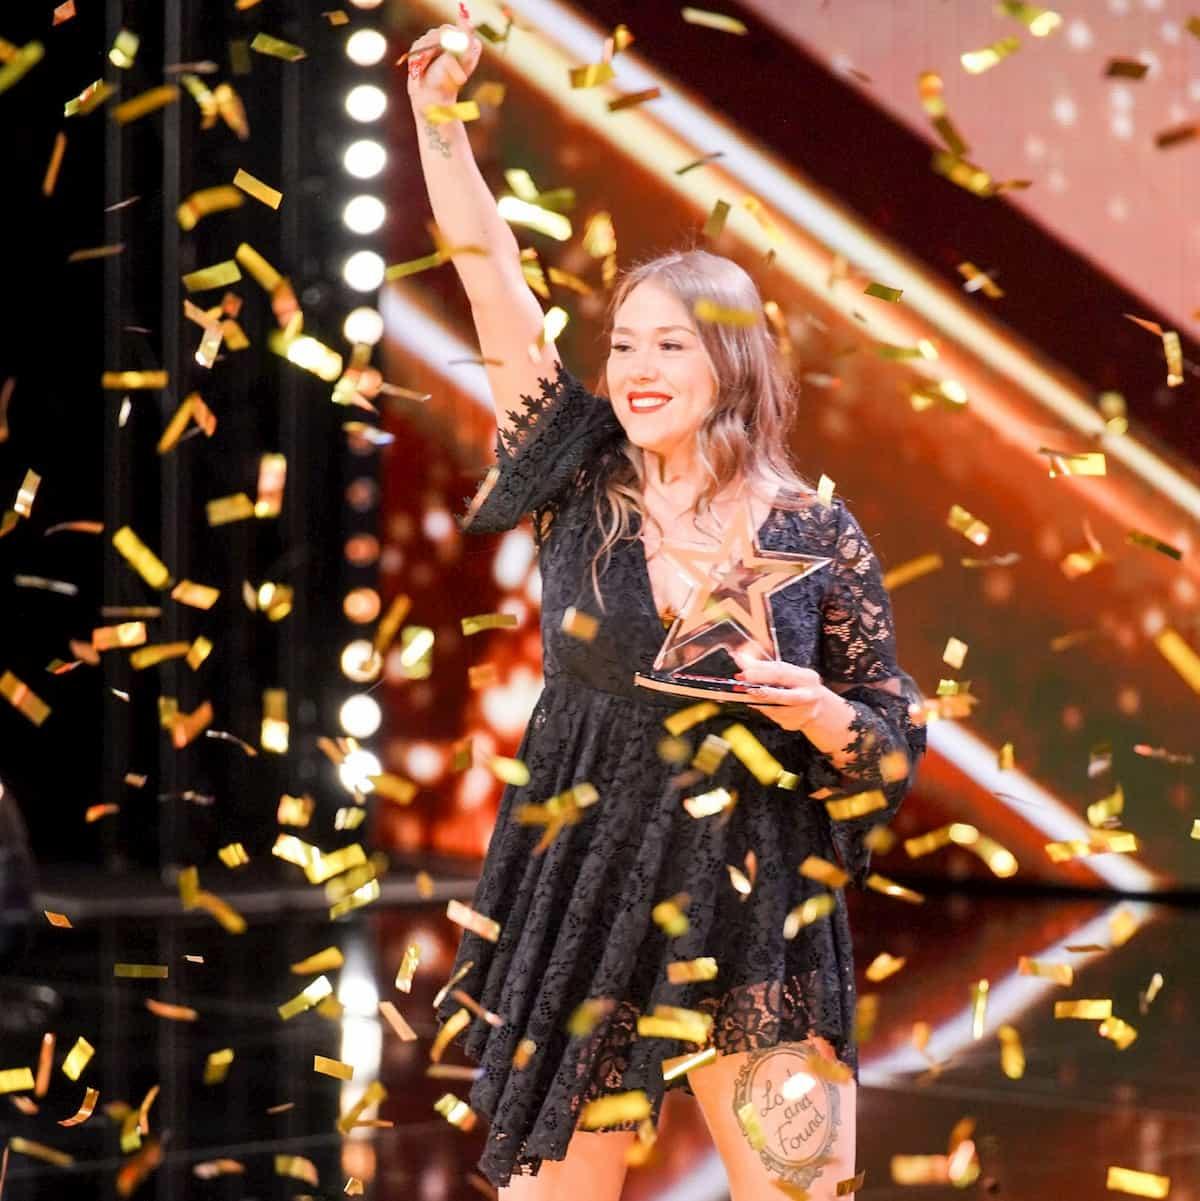 Nina Richel im Finale Supertalent am 21.12.2019